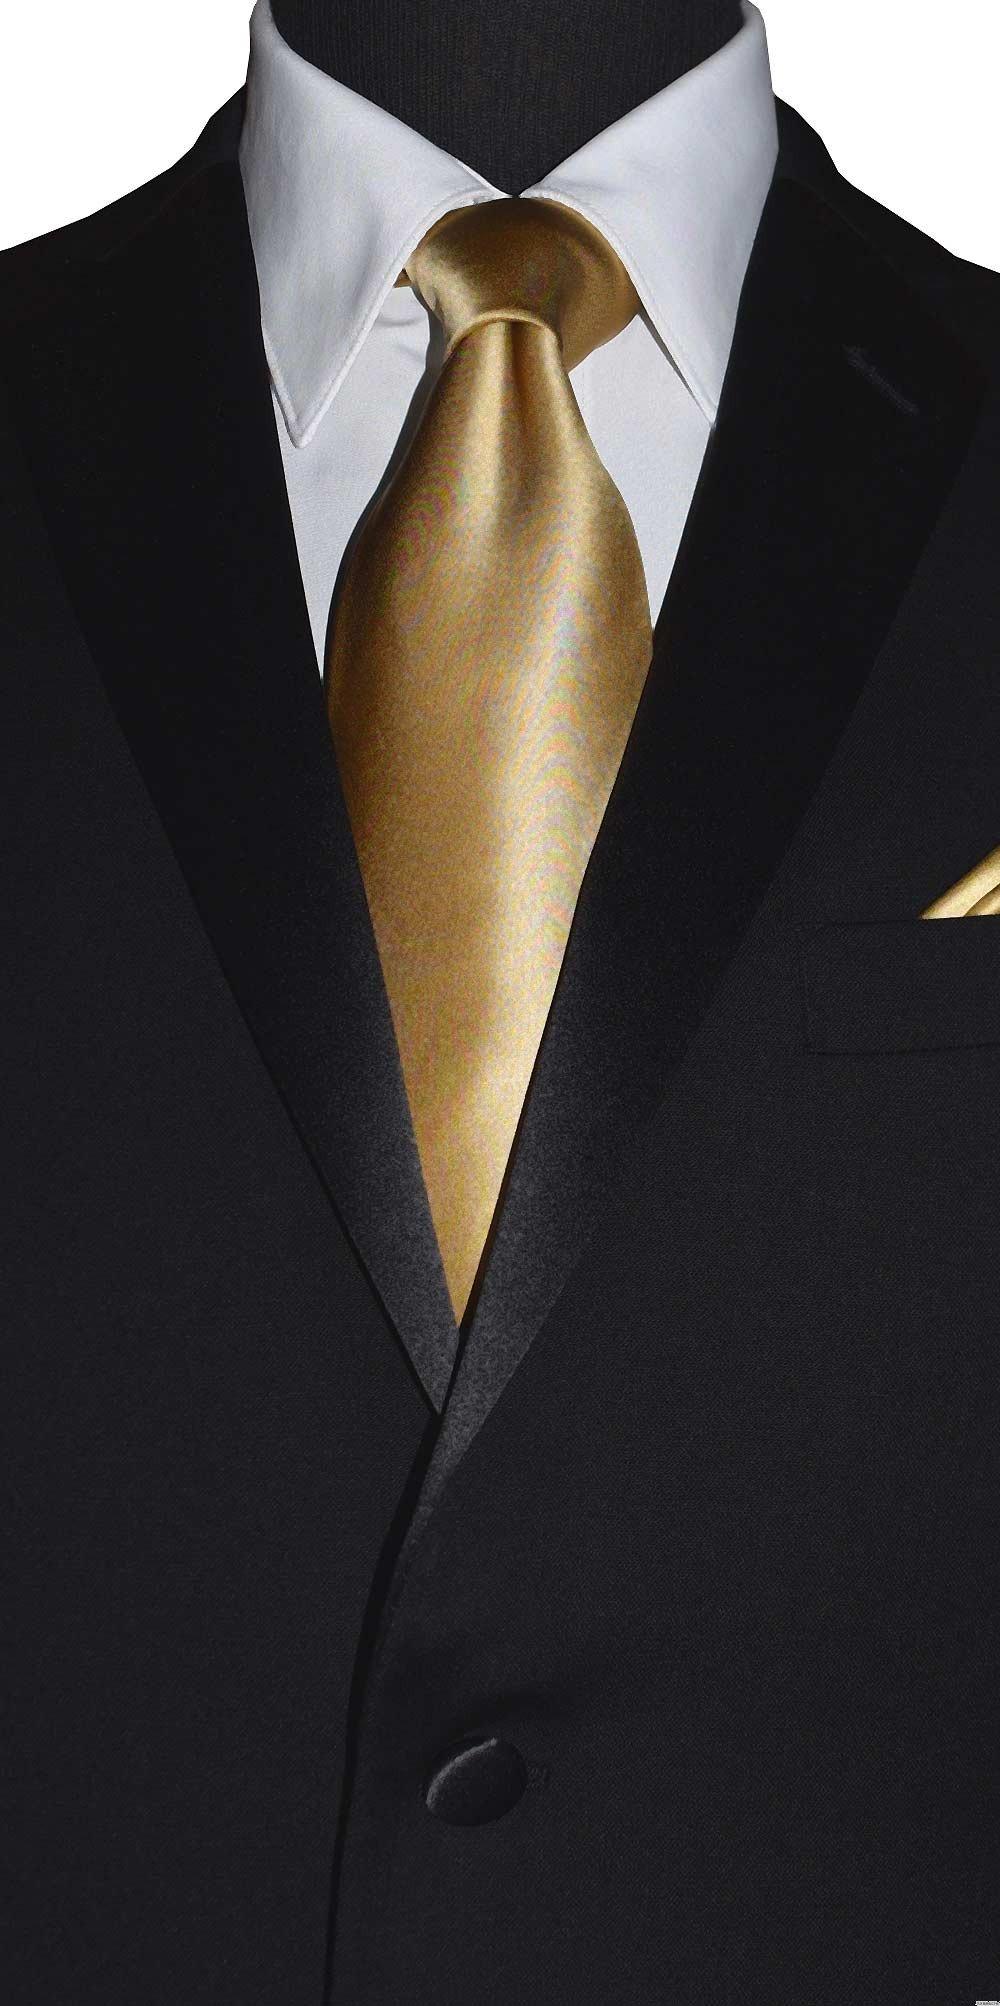 men's gold long tie with black tuxedo